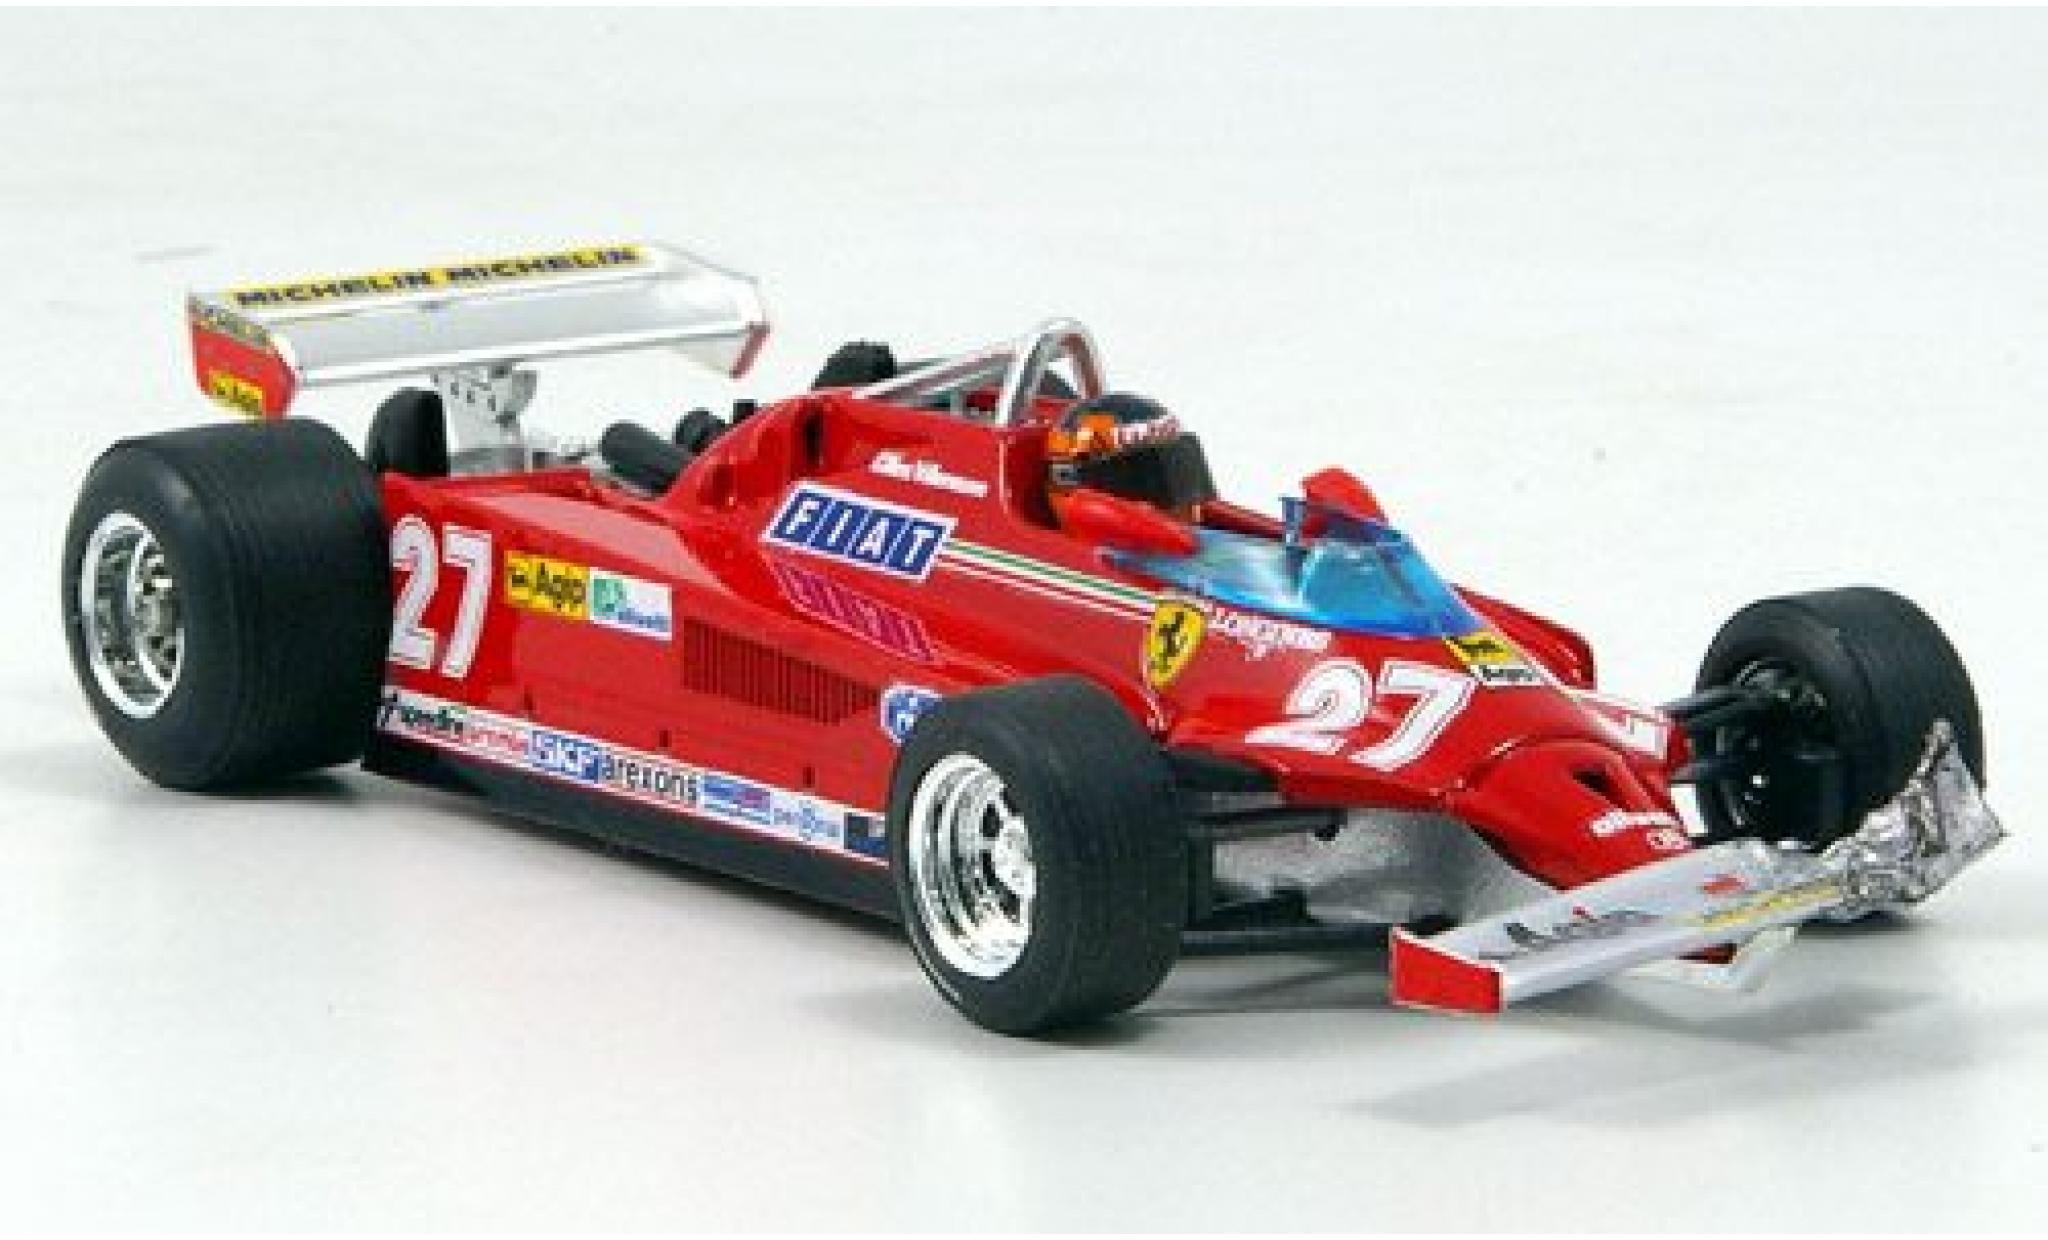 Ferrari 126 1/43 Brumm CK Turbo No.27 Scuderia Formel 1 GP Kanada 1981 avec figurine de conducteur ronde 39-54 G.Villeneuve